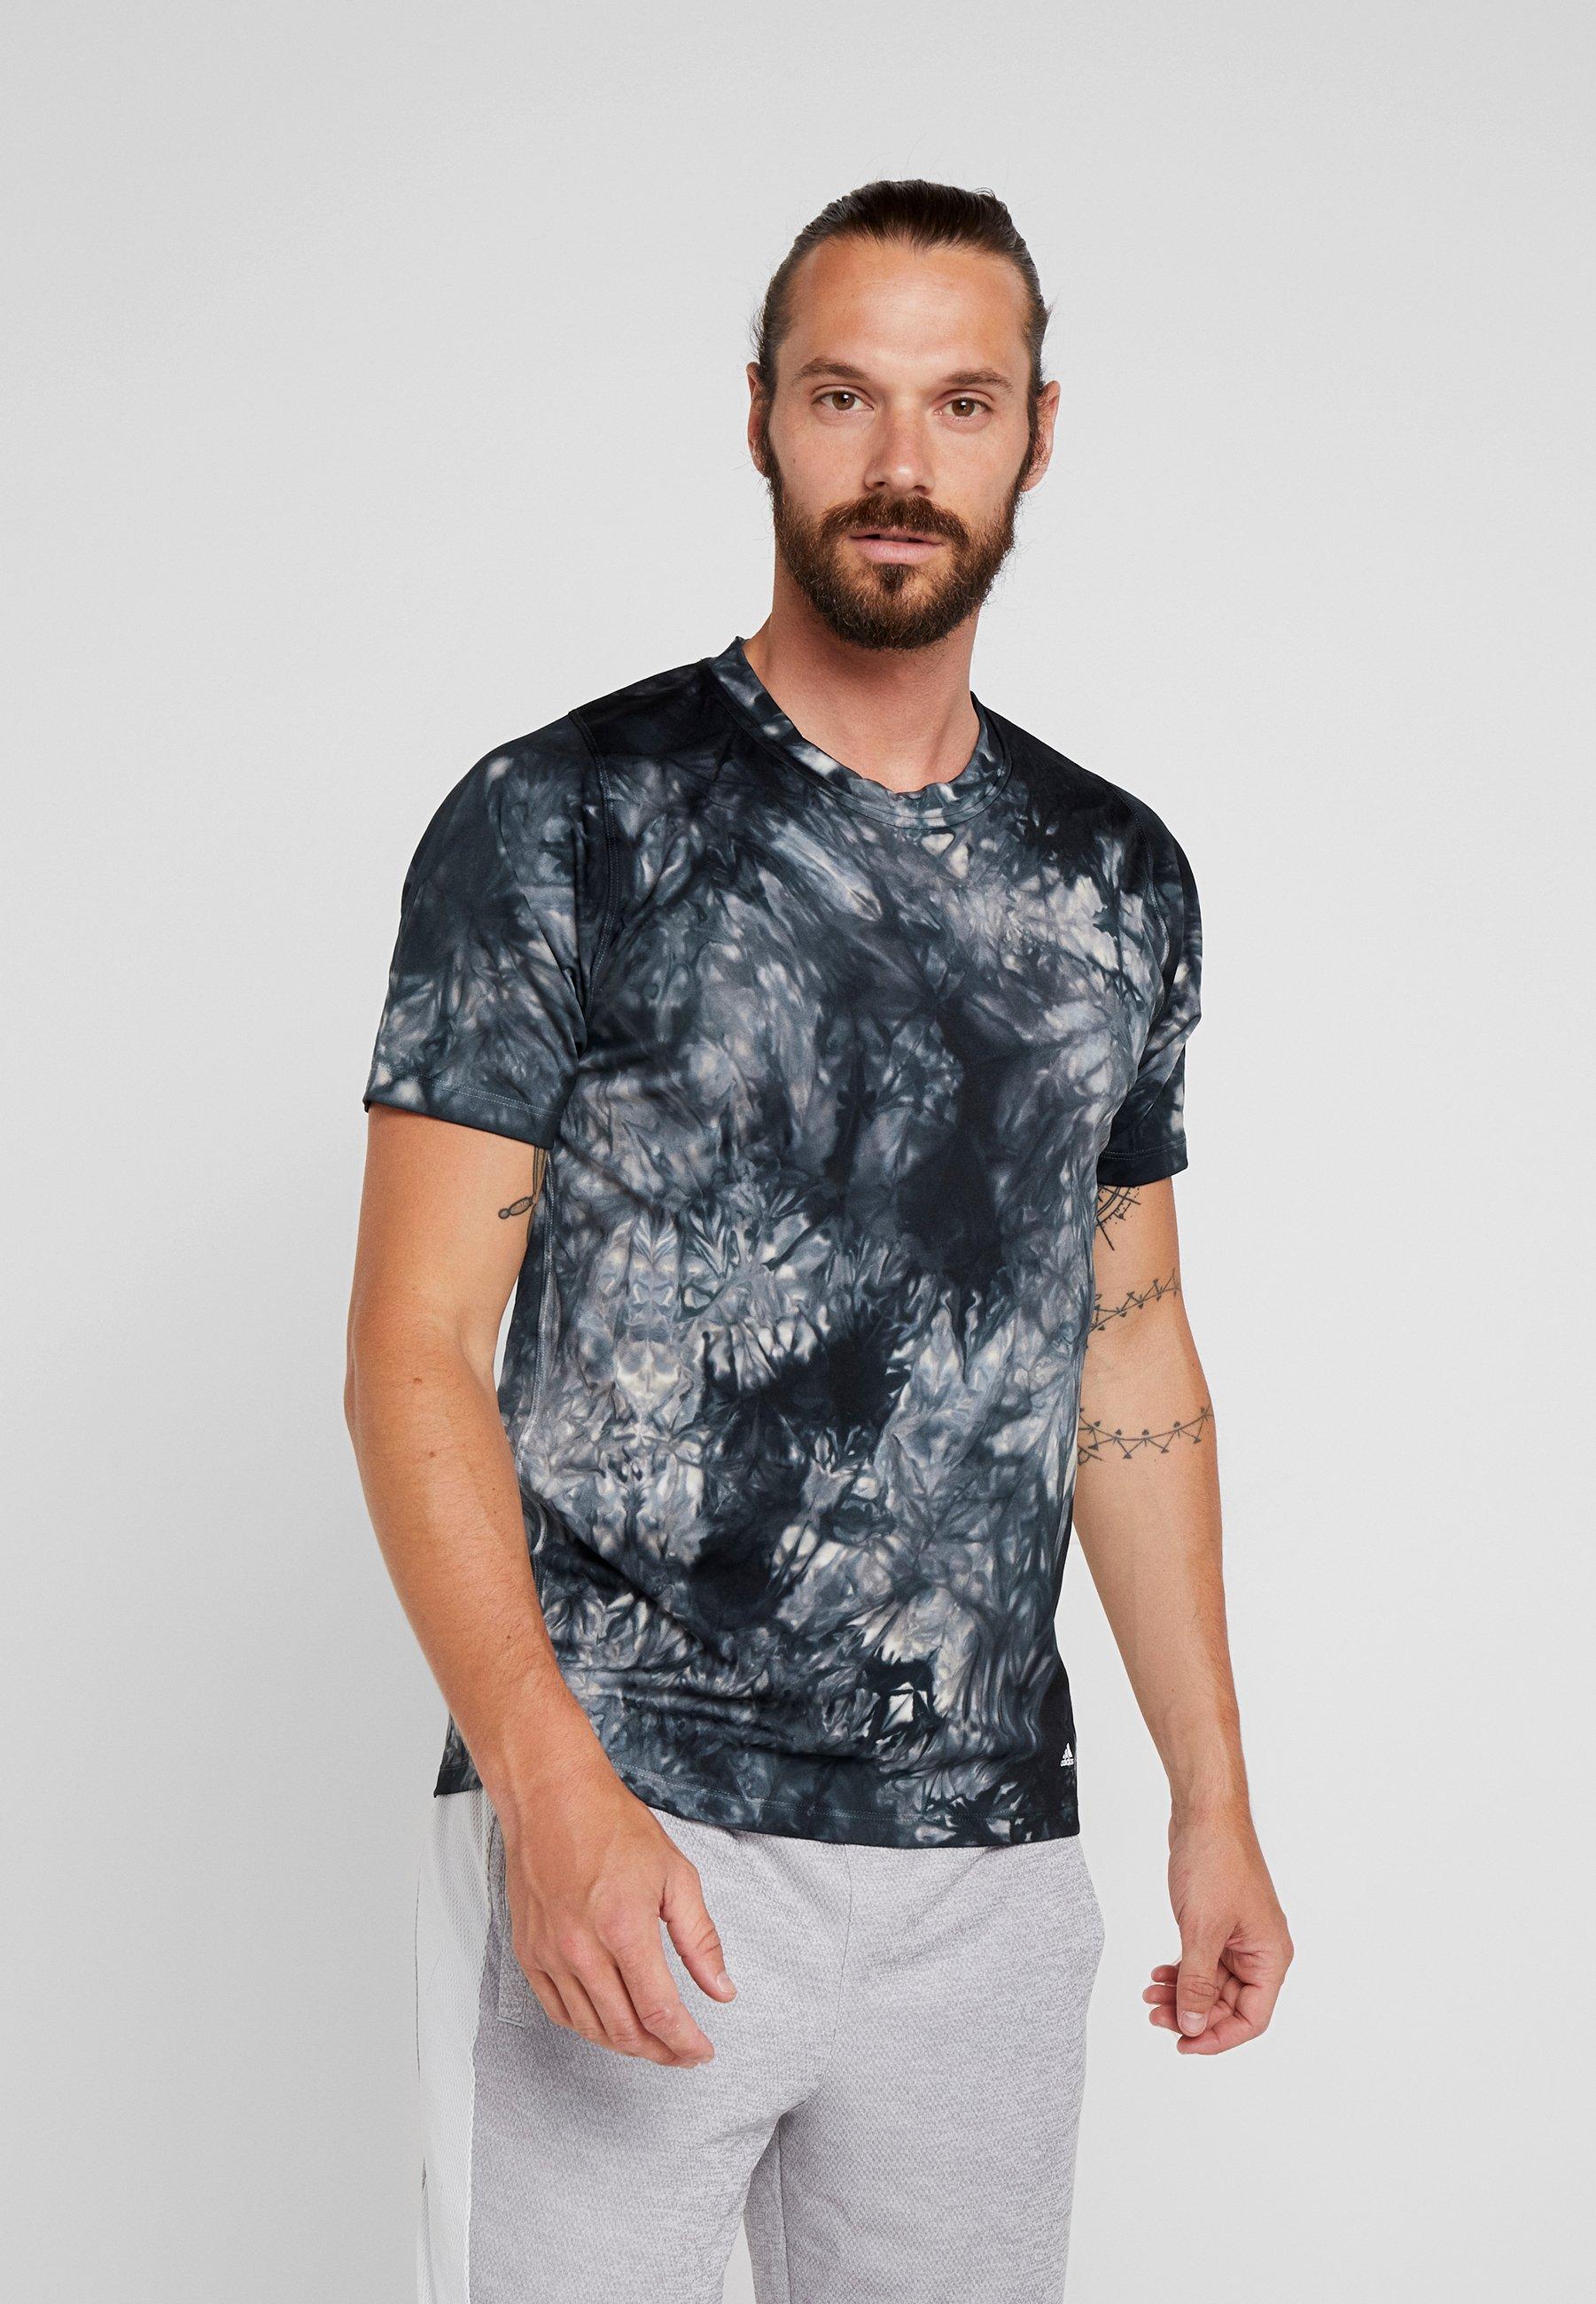 shirt TeeT Black Imprimé Performance Parley Adidas qzVSMLGUp